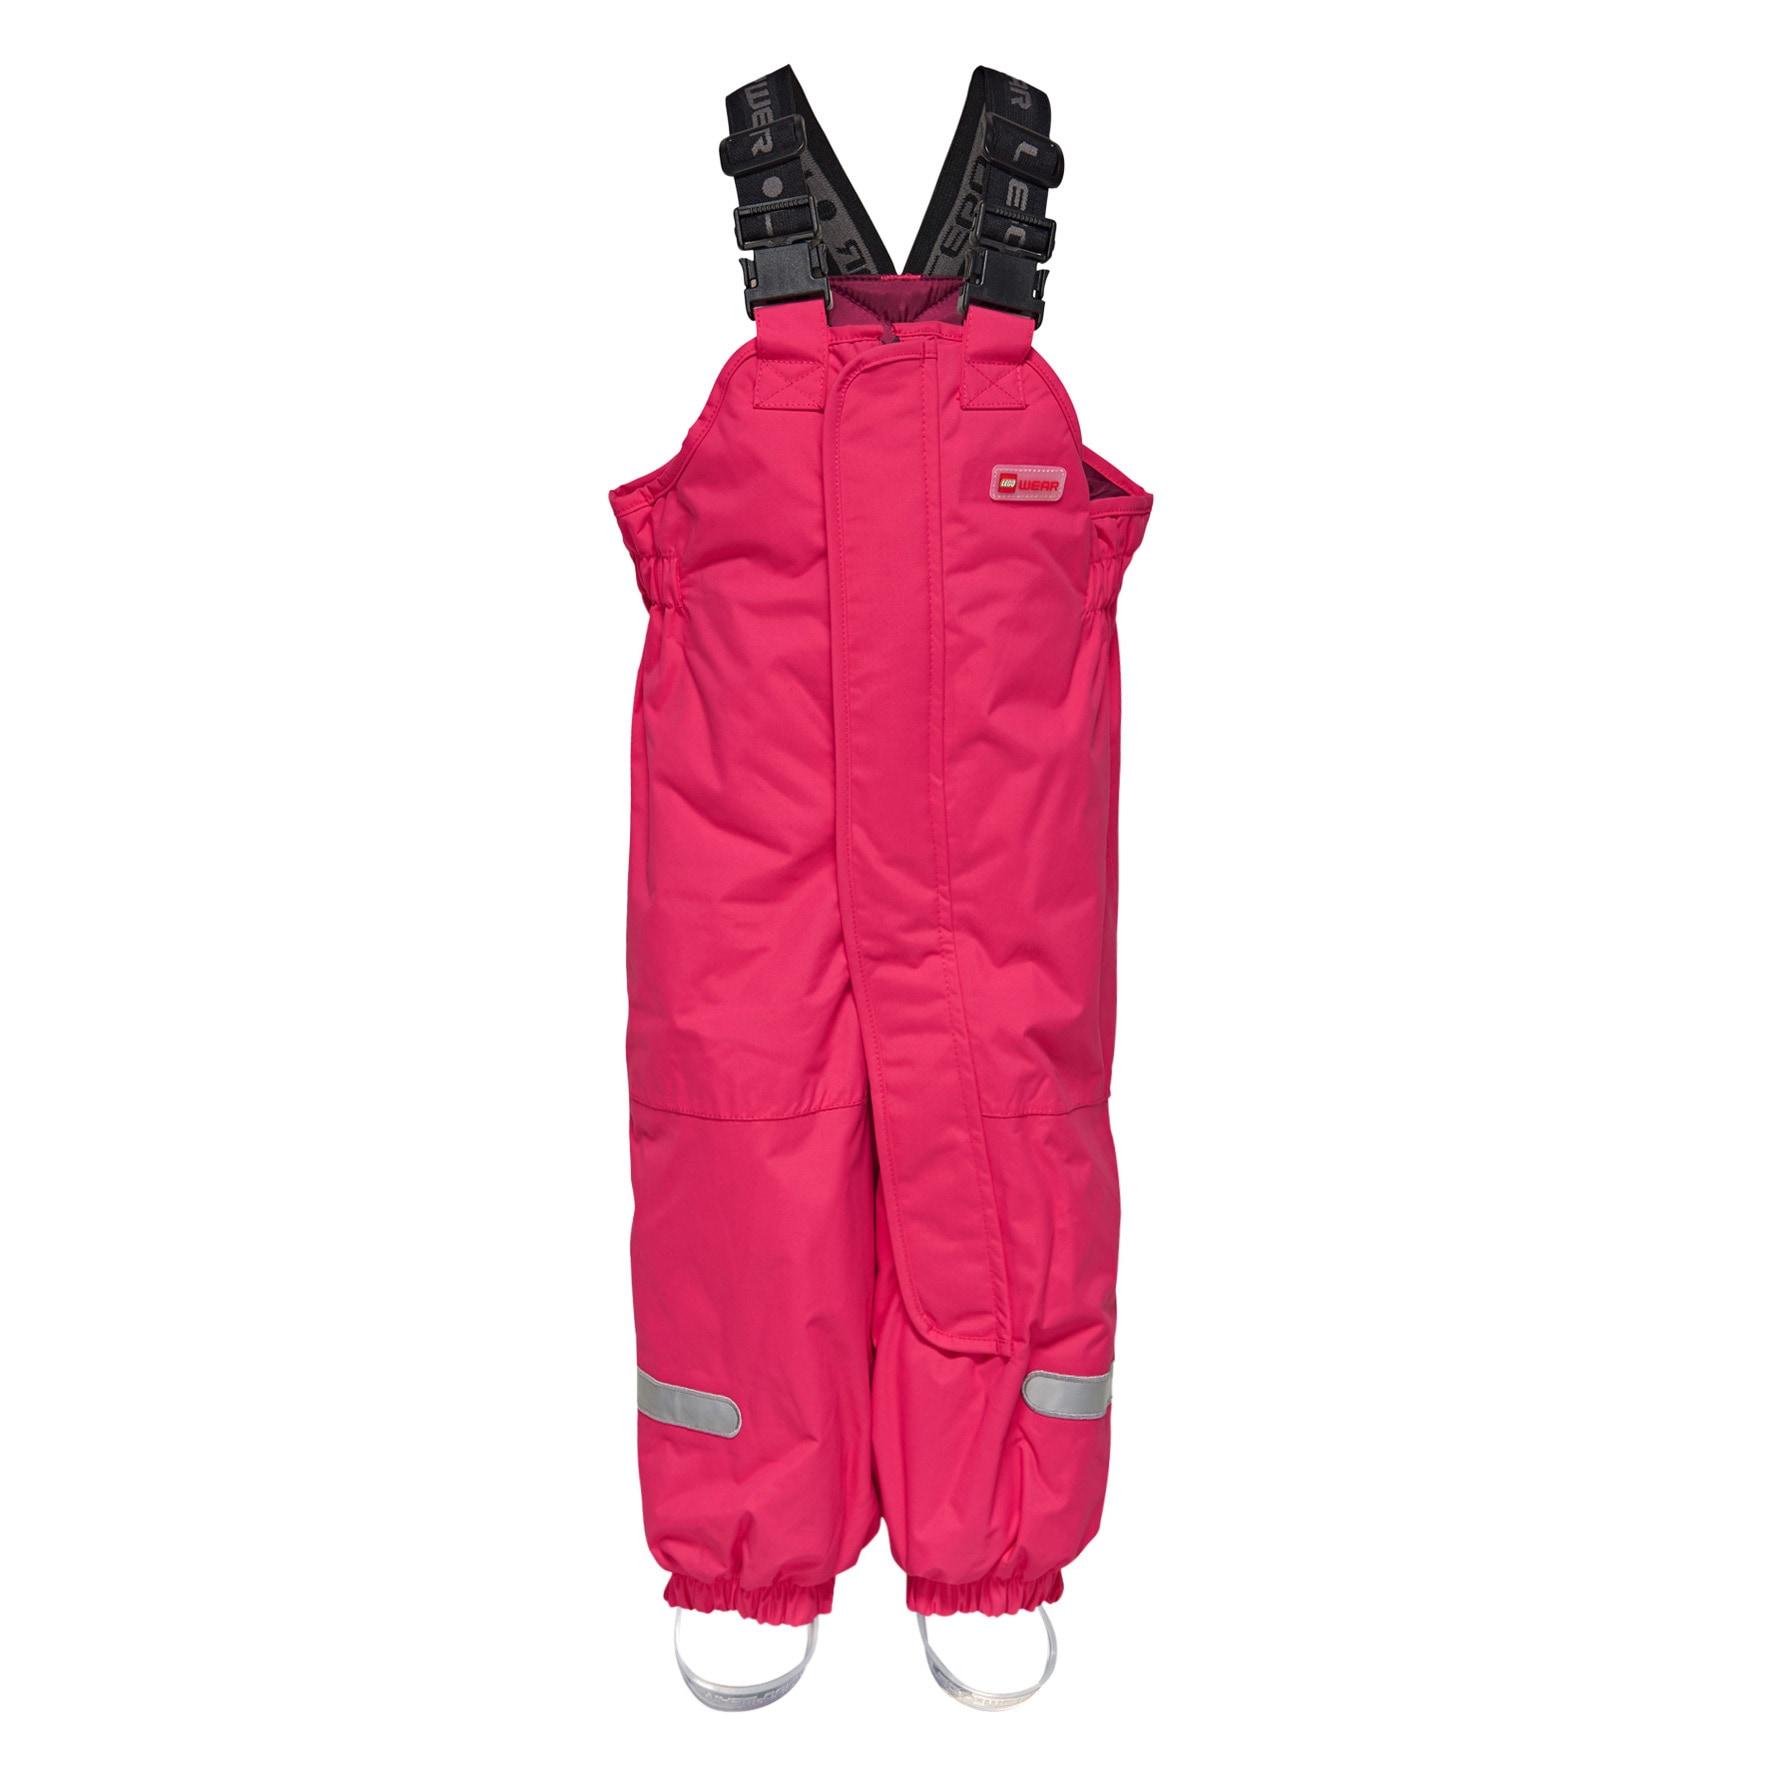 LEGO Wear Skihose PENN 770 rosa Jungen Ski-Bekleidung Ski Sportarten